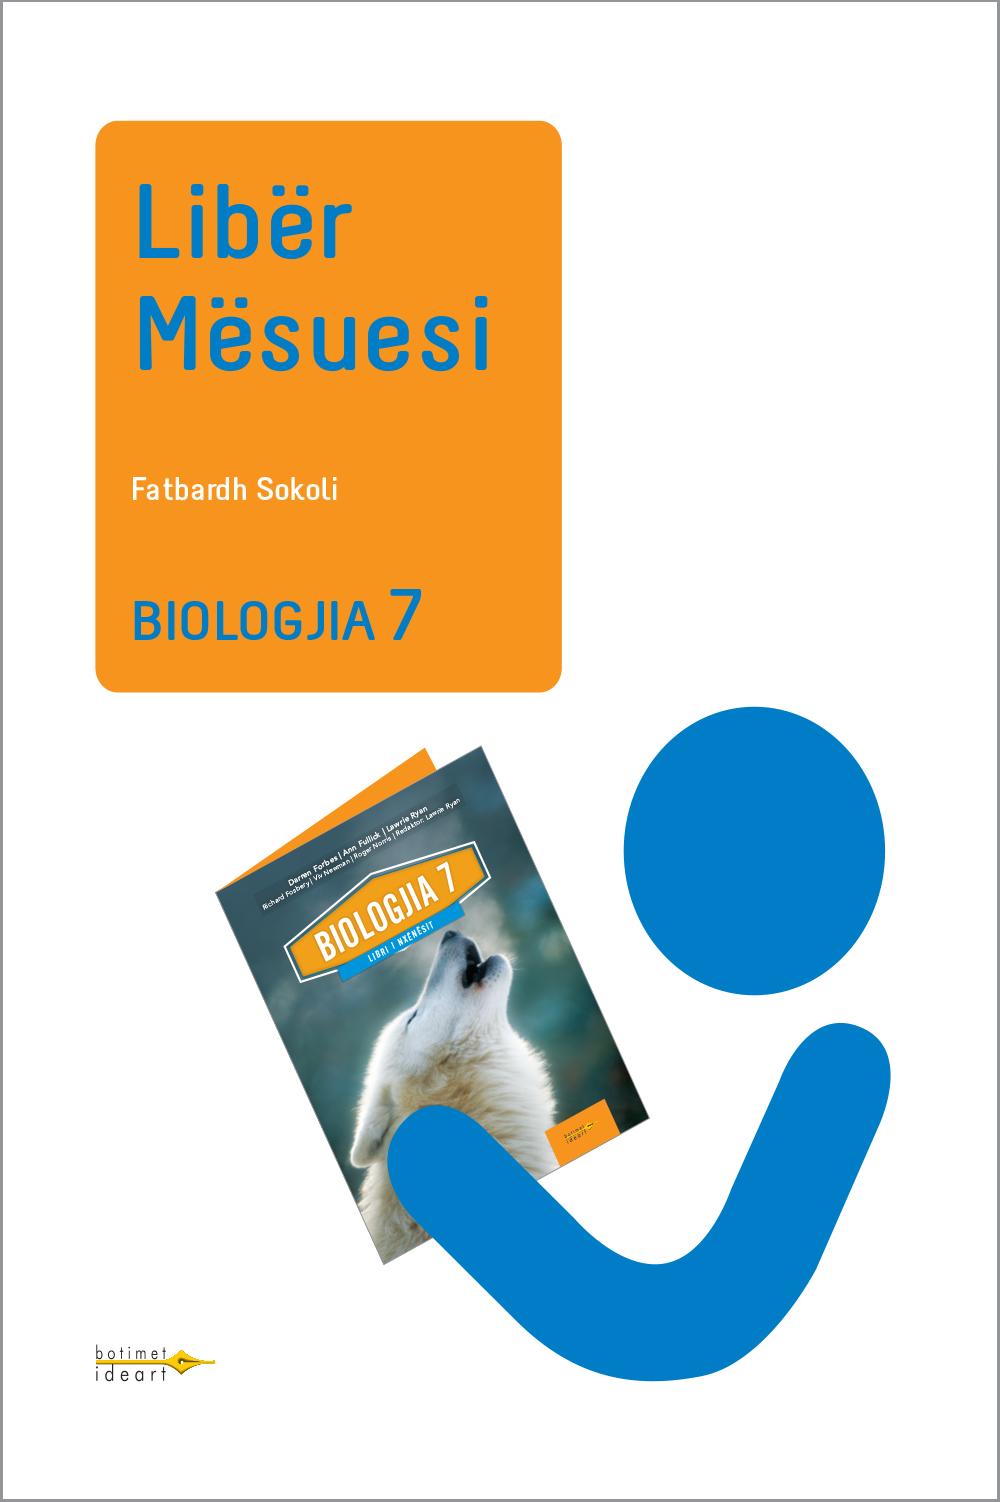 Biologjia 7<br>Libër Mësuesi